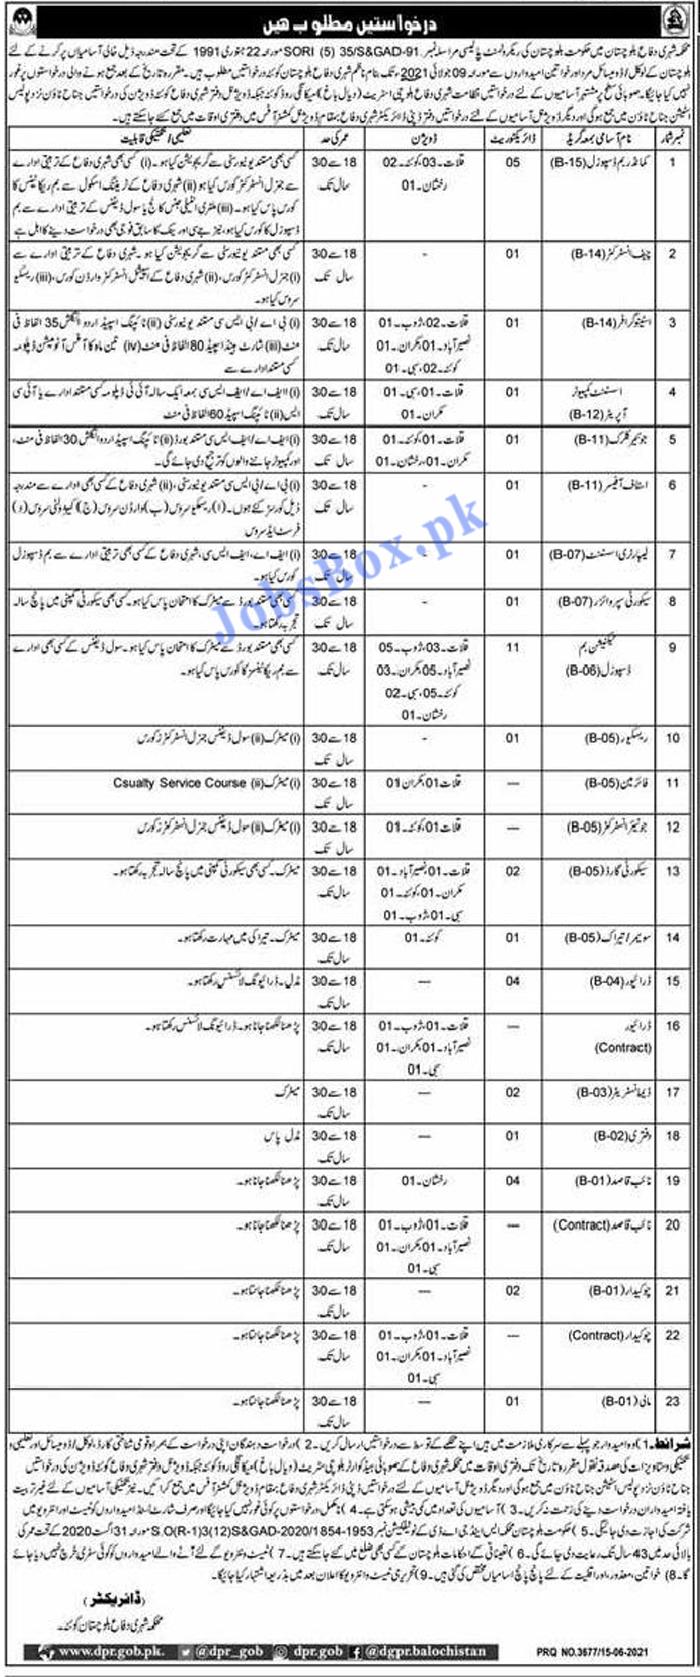 Civil Defence Balochistan Jobs 2021 Latest Vacancies - Government of Balochistan Civil Defence Jobs 2021 in Pakistan